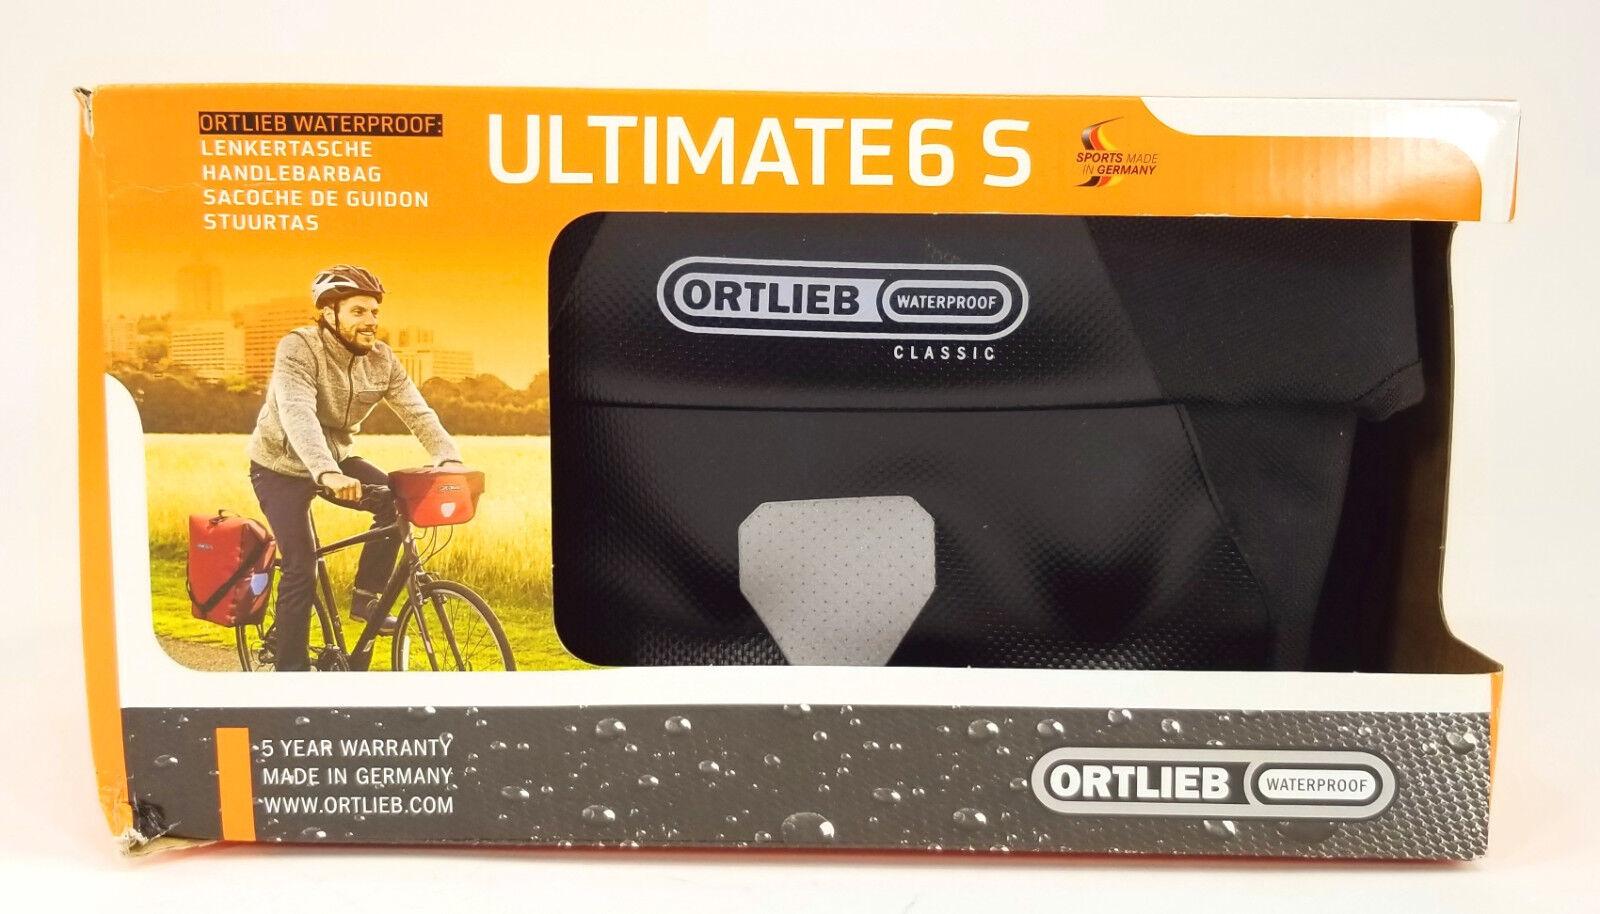 Ortlieb Ultimate6 S Classic Bicycle Handlebar Bag, Waterproof